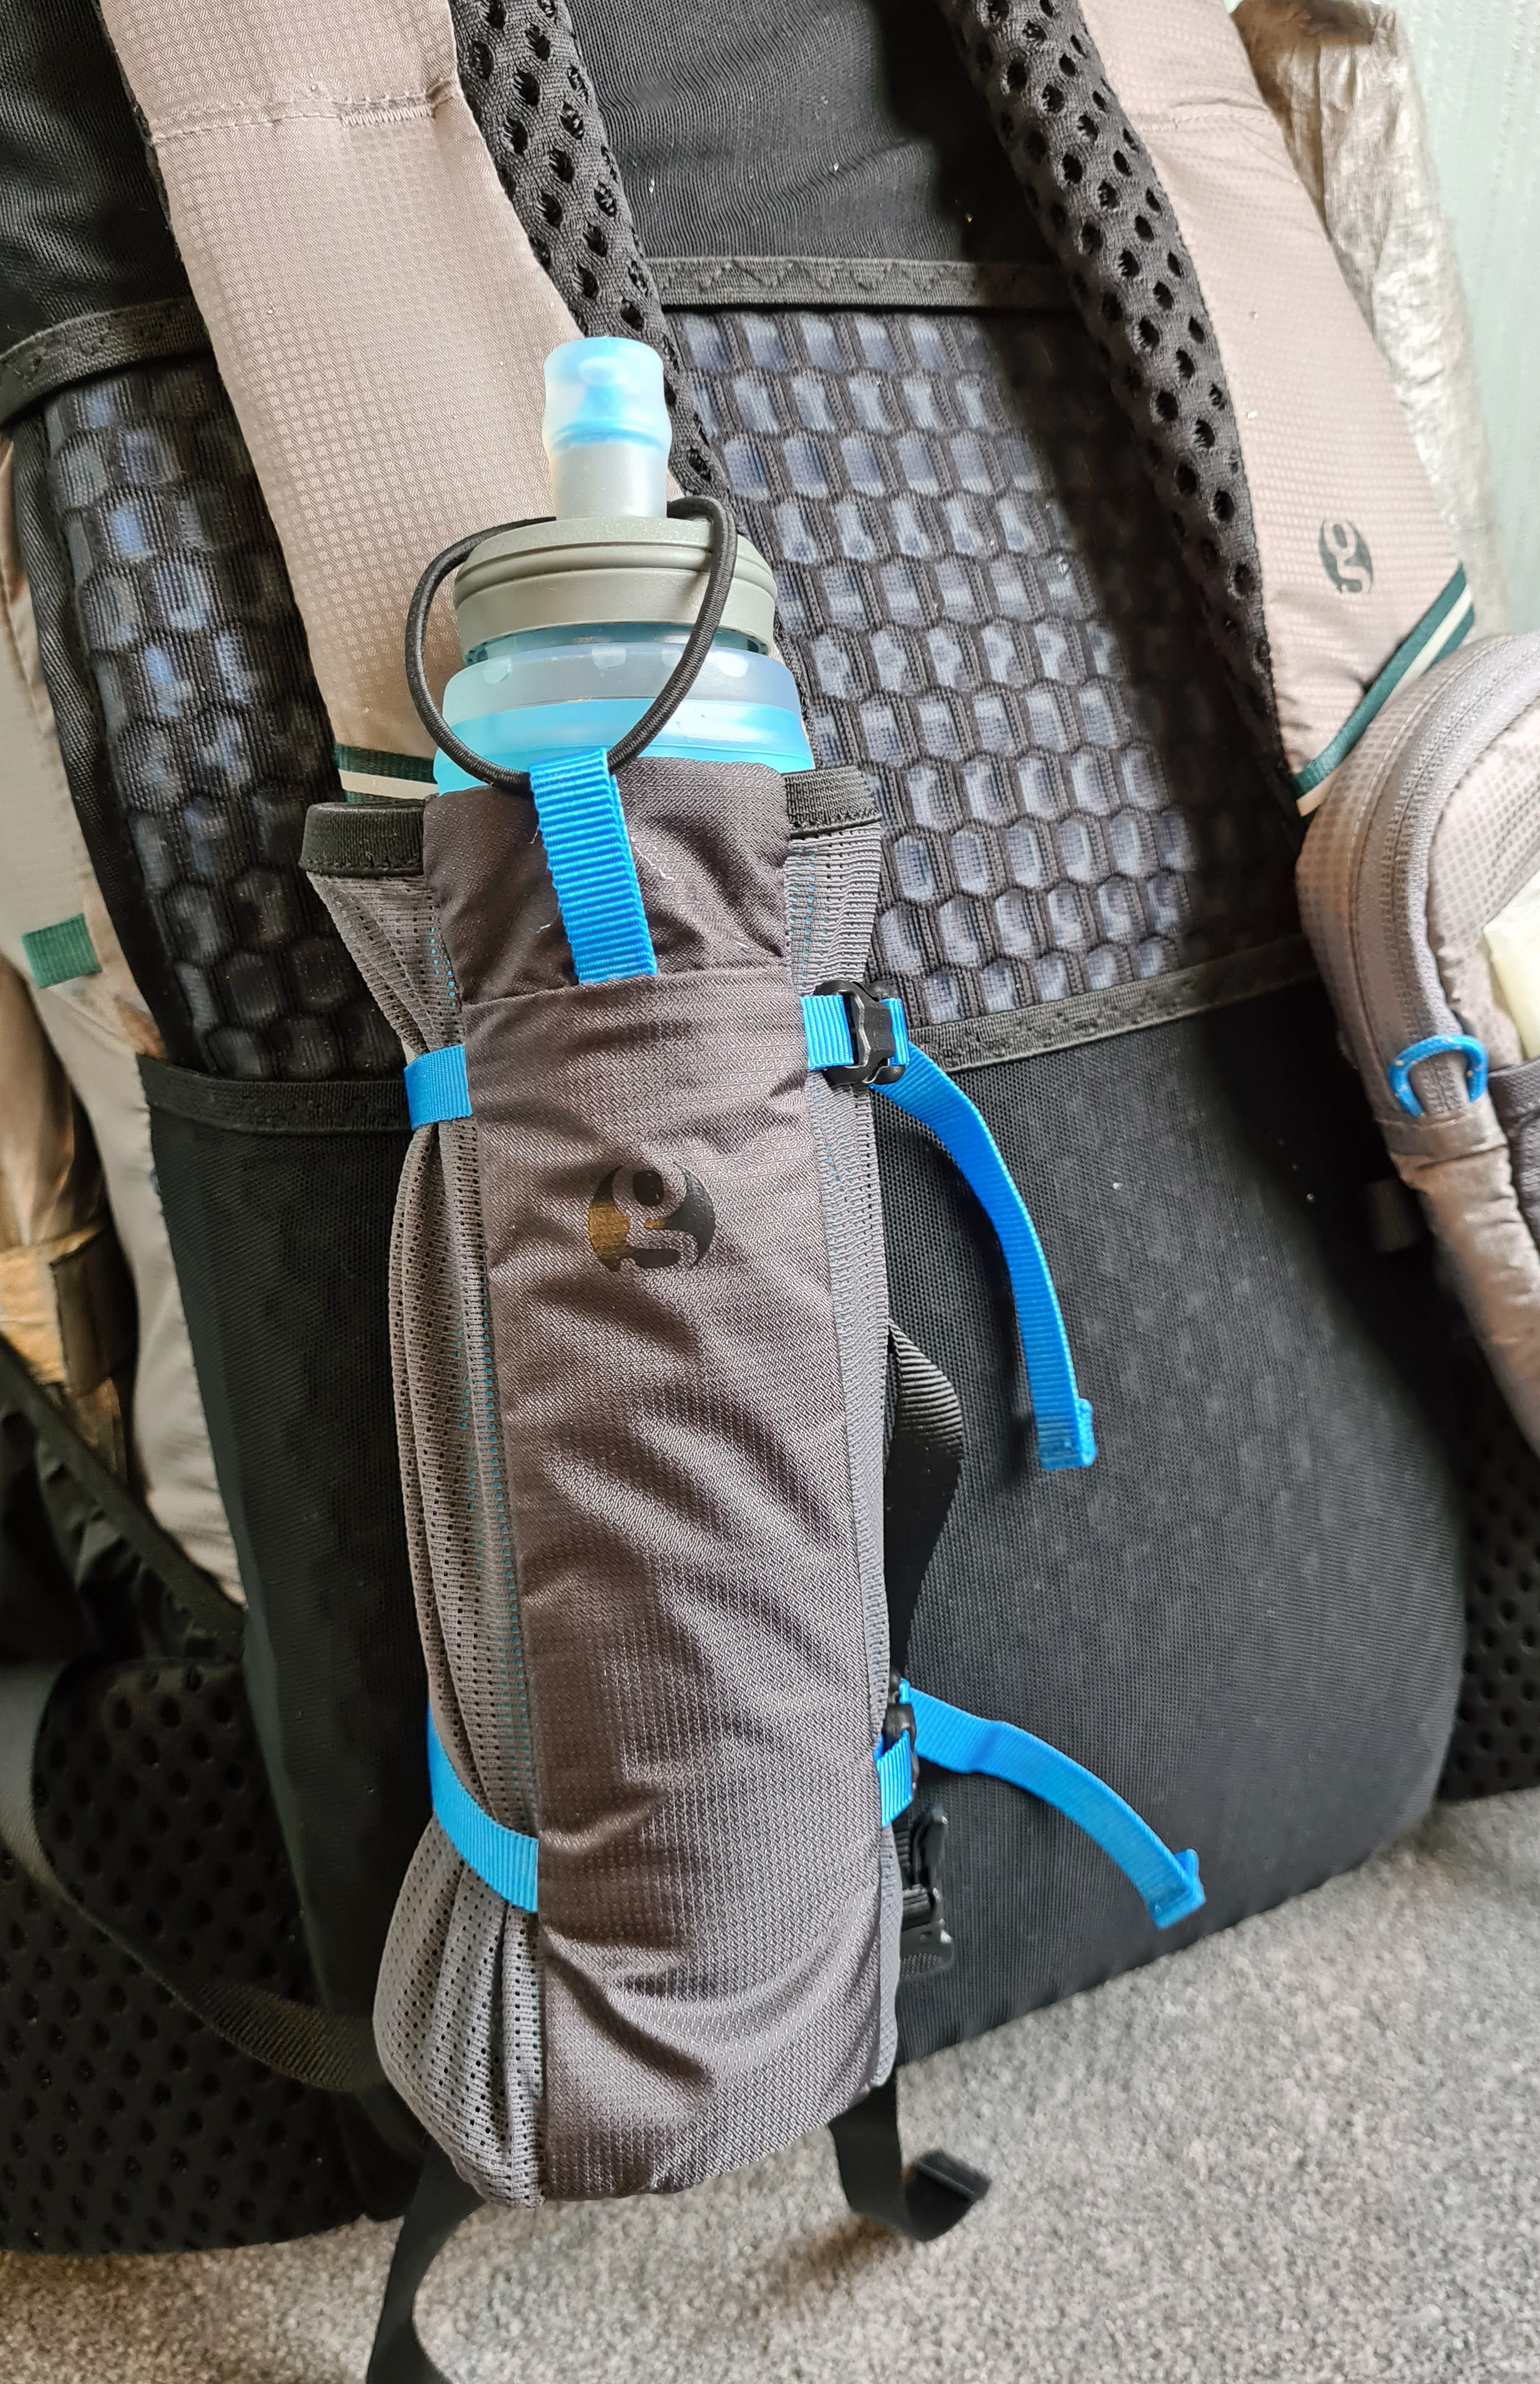 500ml HydraPak Ultraflask in Gossamer Gear Bottle Rocket shoulder strap bottle holder